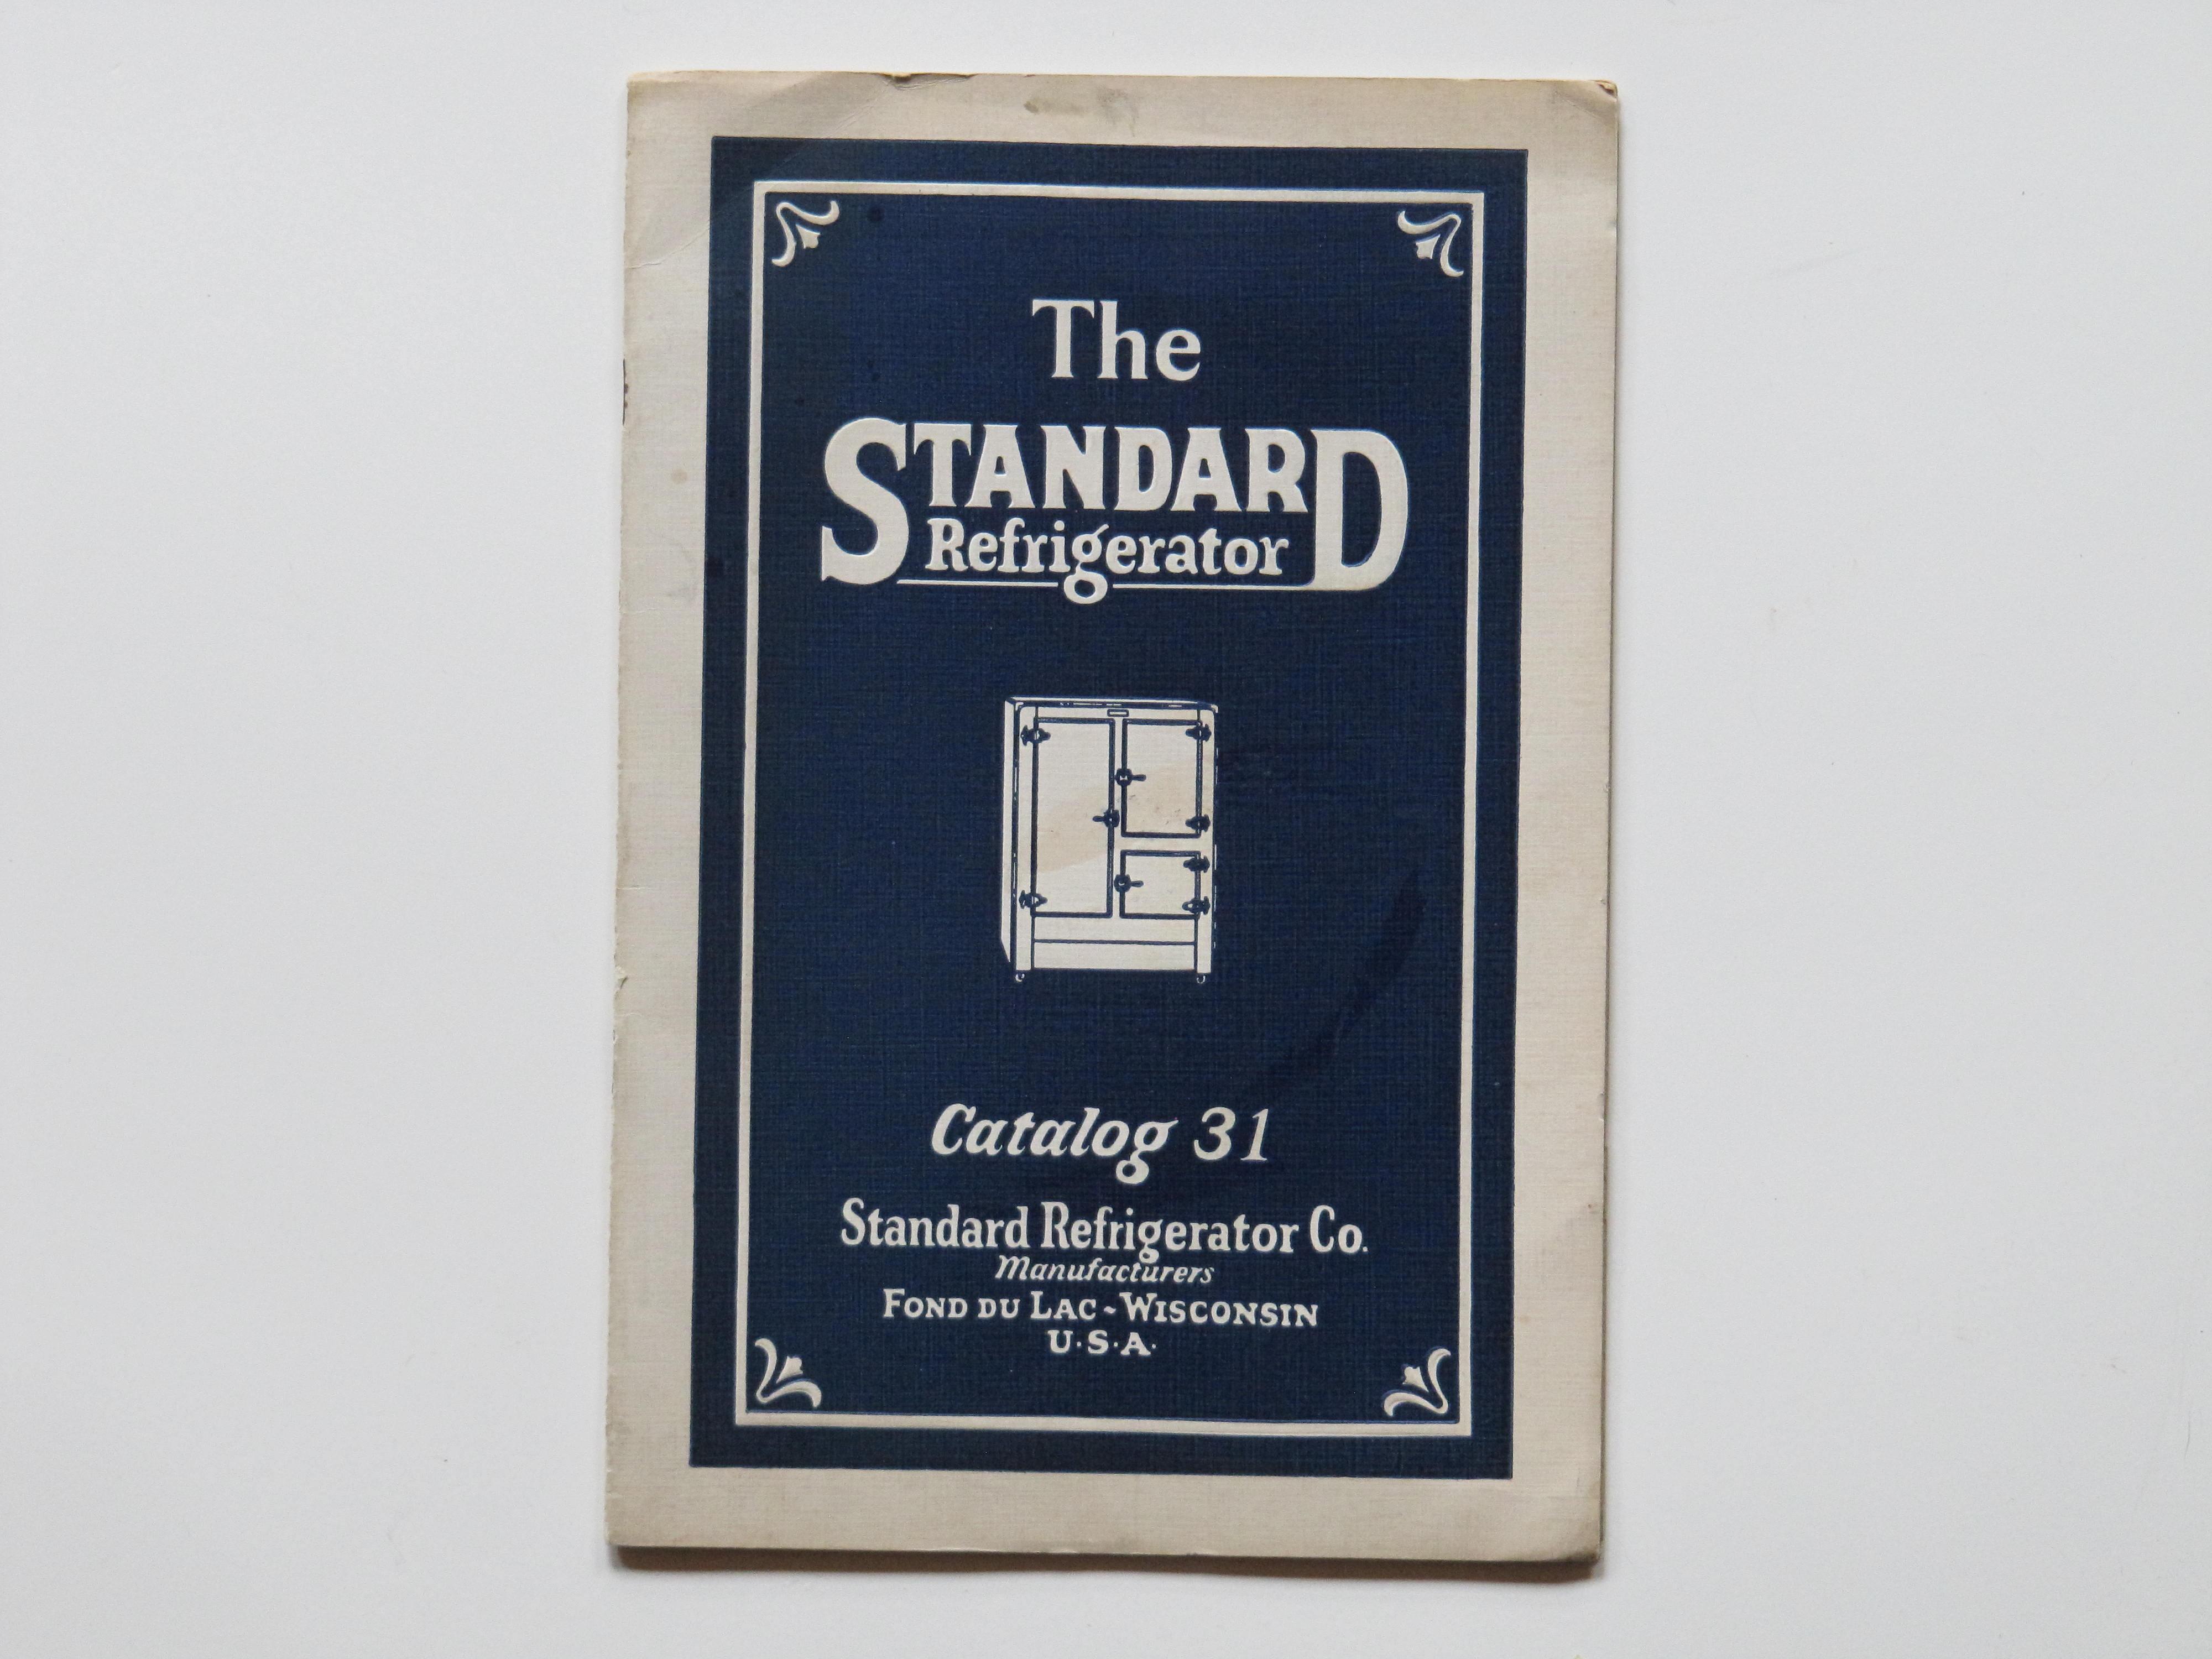 Standard Refrigerator Co Fond Du lac Wisconsin